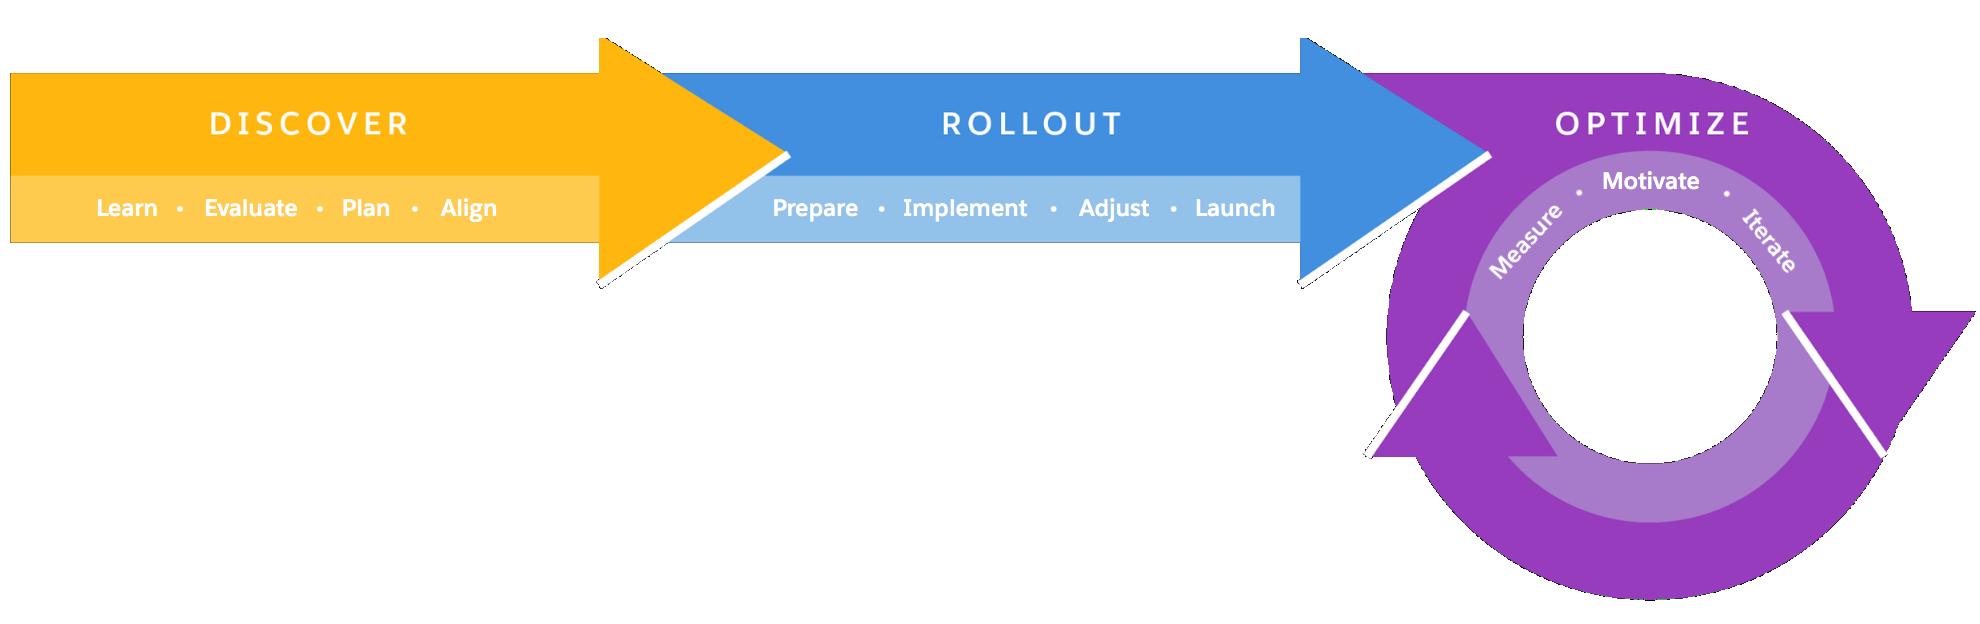 Lightning Experience の移行のフレームワークのフェーズとステージを示す画像